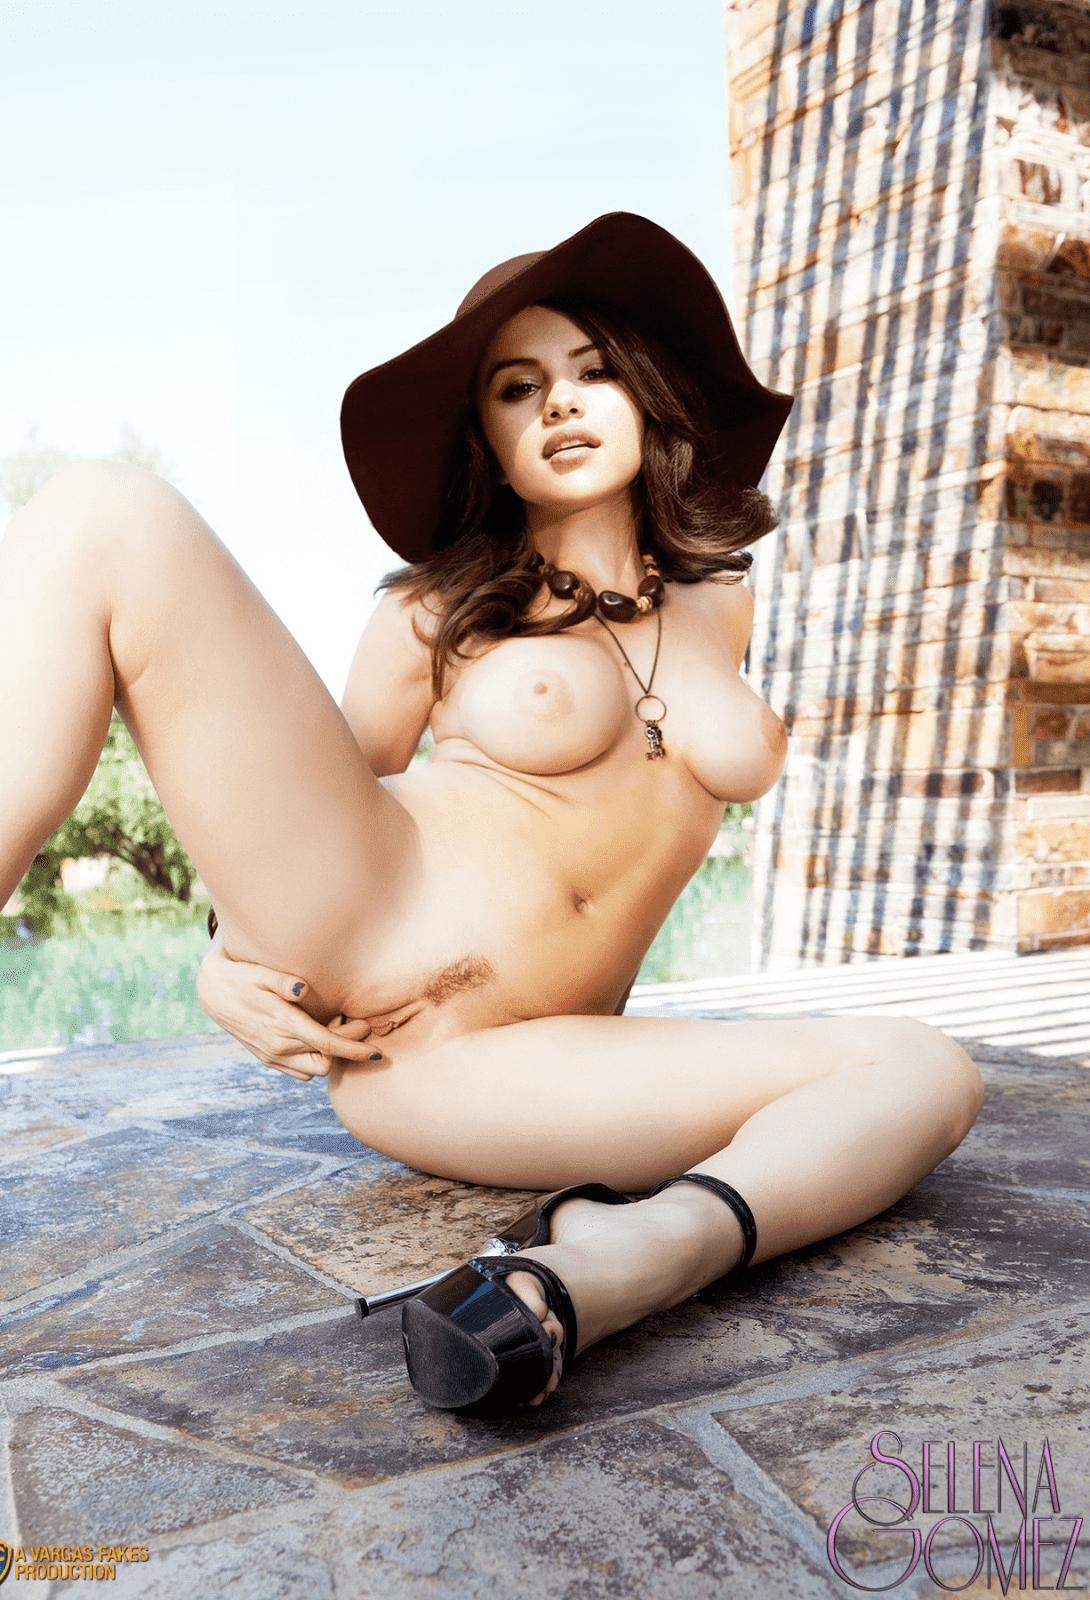 Selena Gomez Fingering Pussy Outdoor